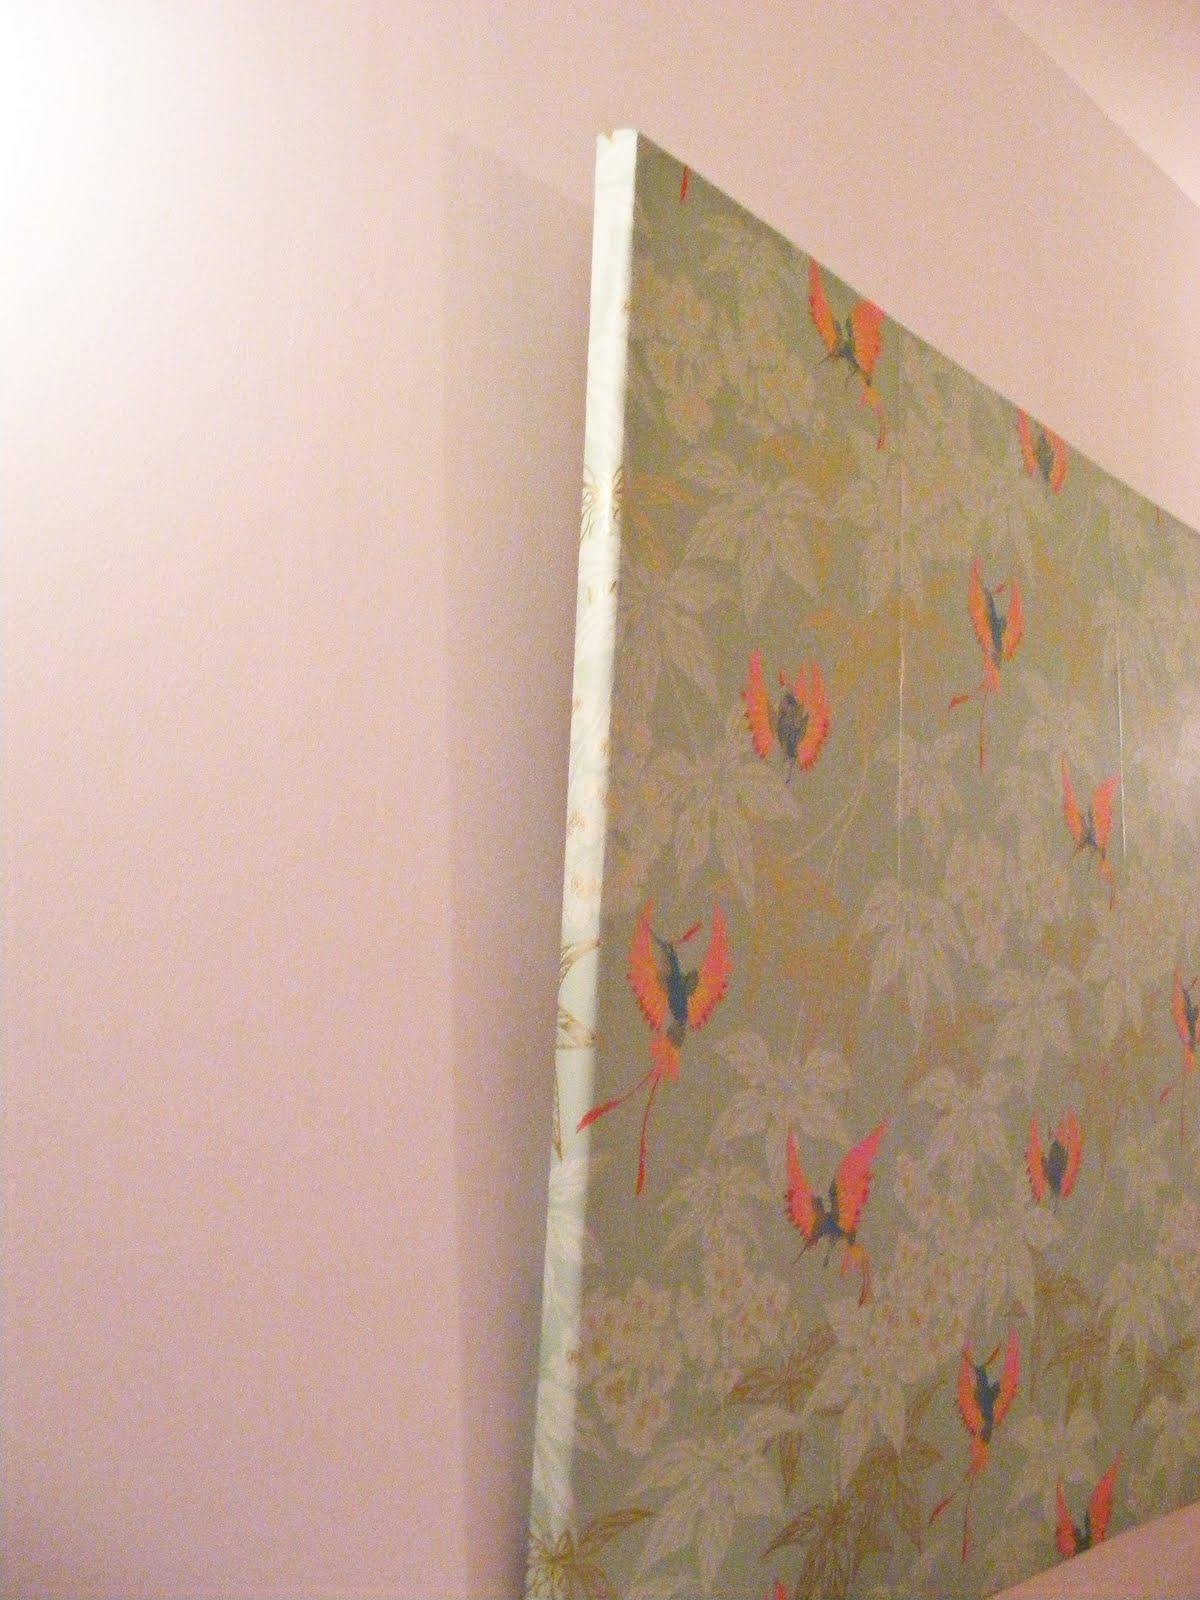 wallpaper: Do Wallpaper Bubbles Dry Out